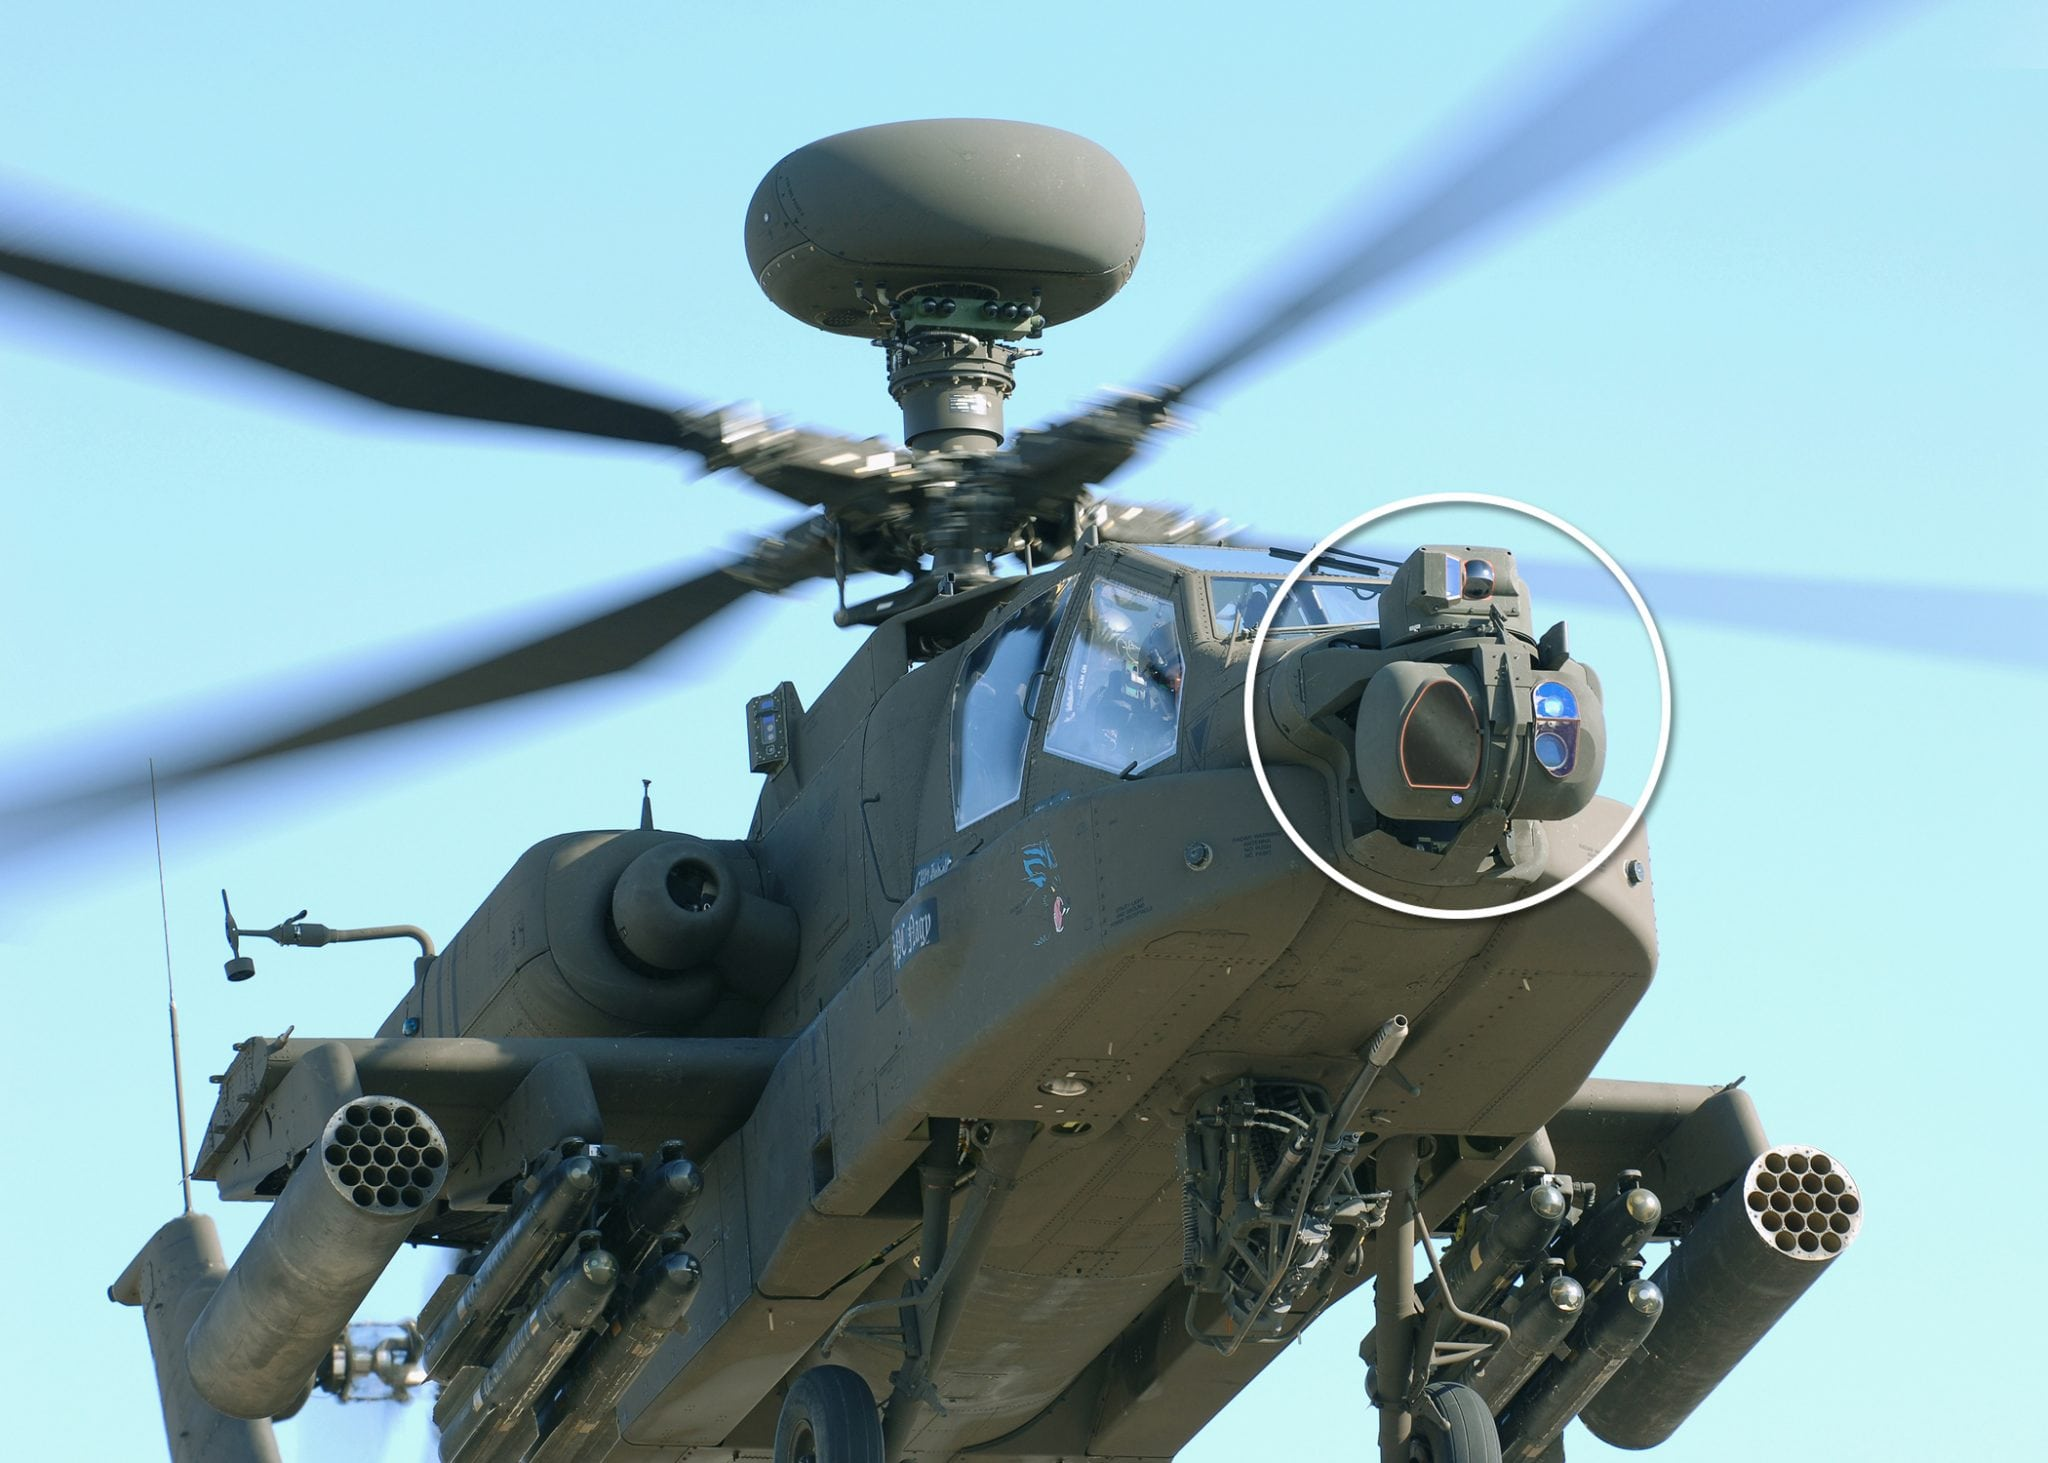 The Modernized Target Acquisition Designation Sight/Pilot Night Vision Sensor (M-TADS/PNVS) system, the advanced electro-optical fire control system that AH-64D/E Apache helicopter